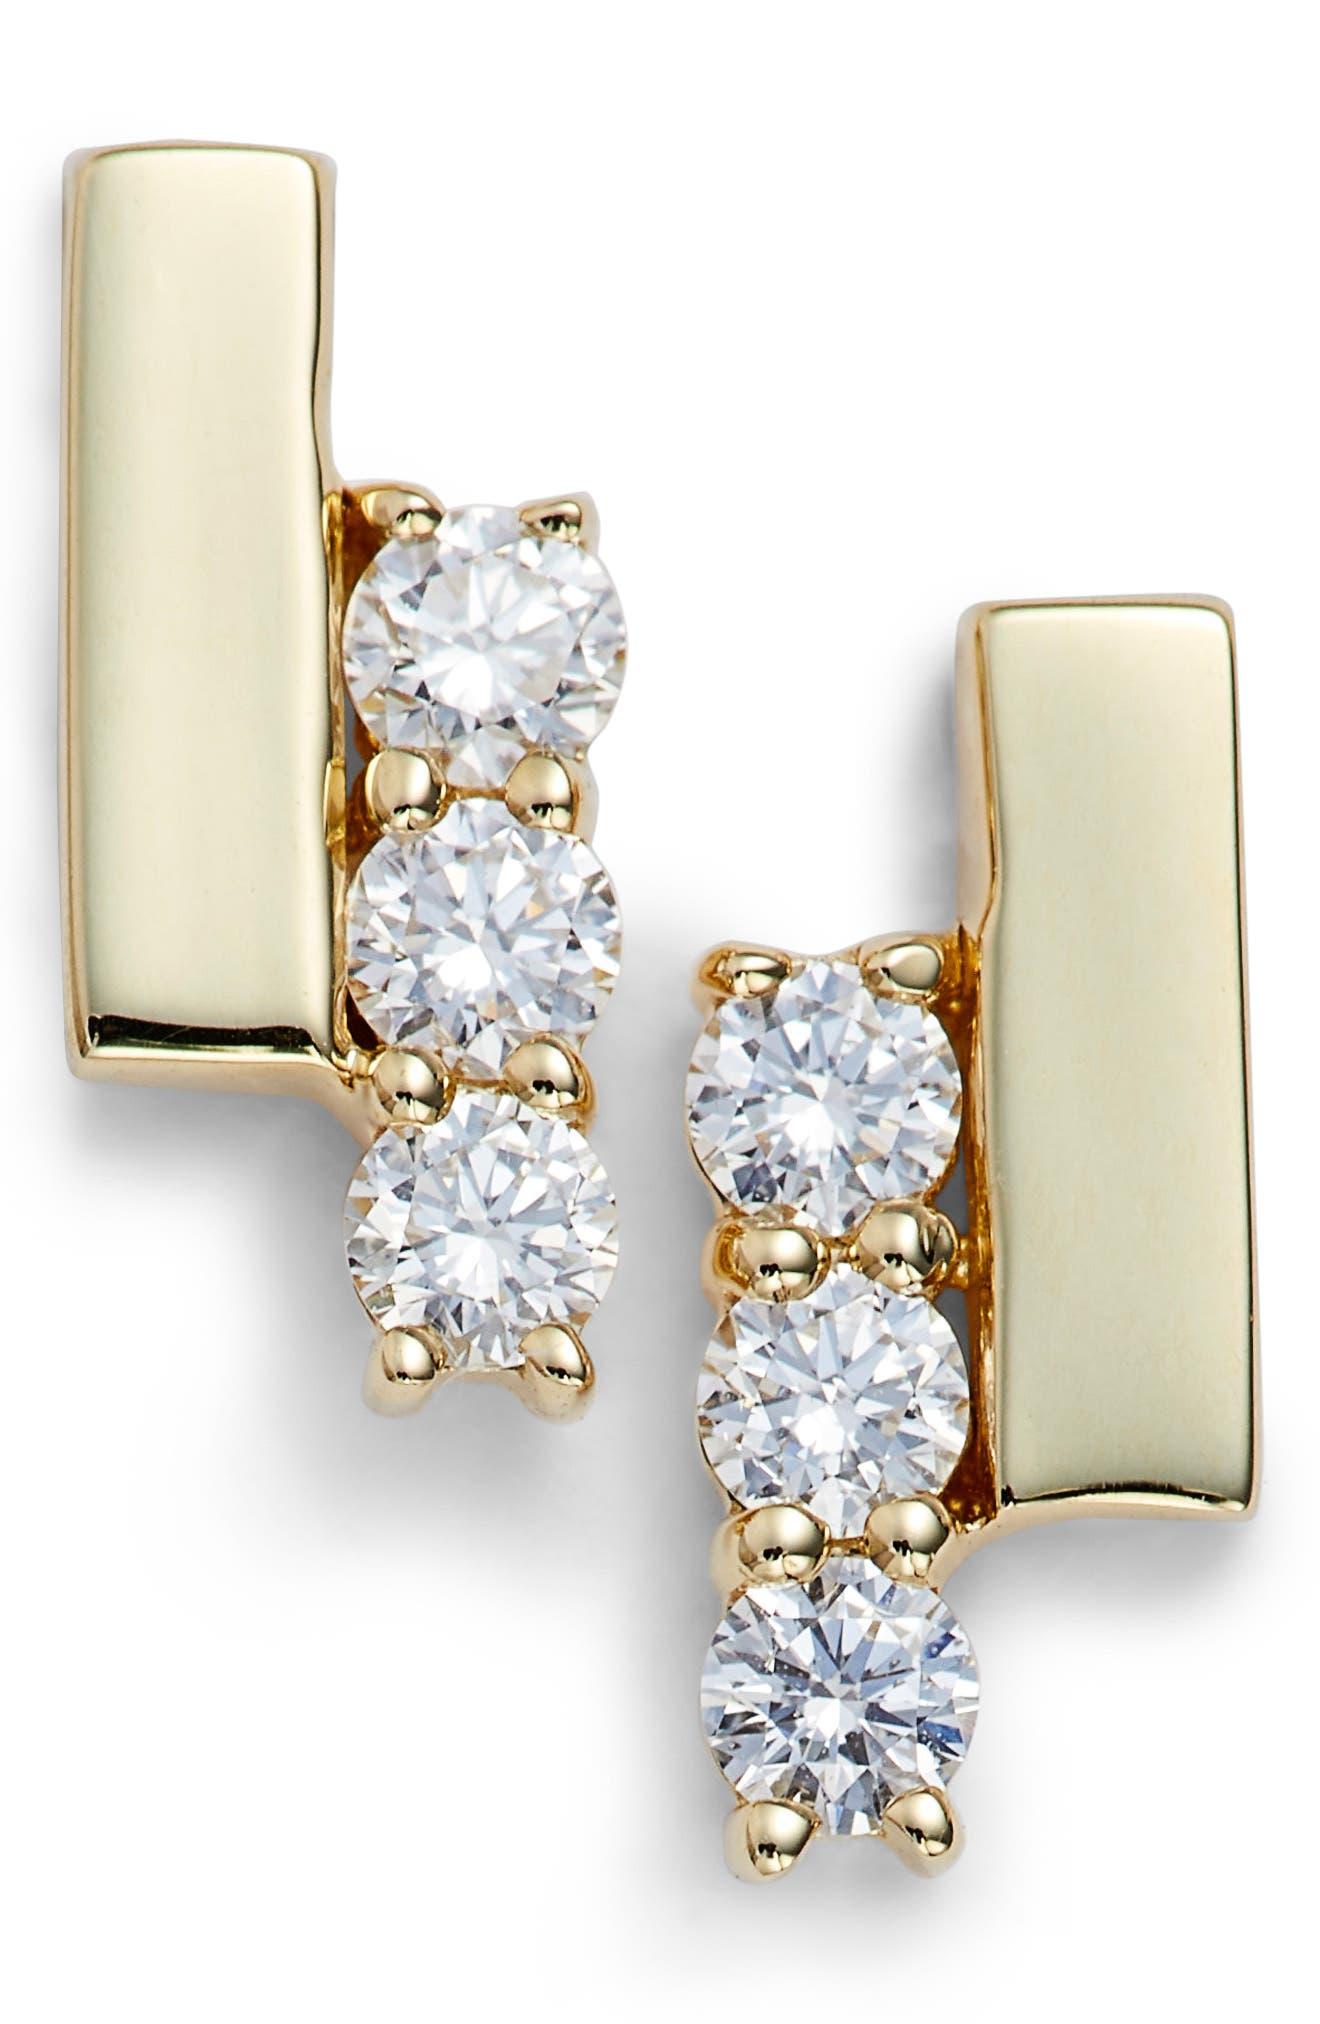 Sylvie Rose Diamond Bar Stud Earrings,                             Main thumbnail 1, color,                             YELLOW GOLD/ DIAMOND